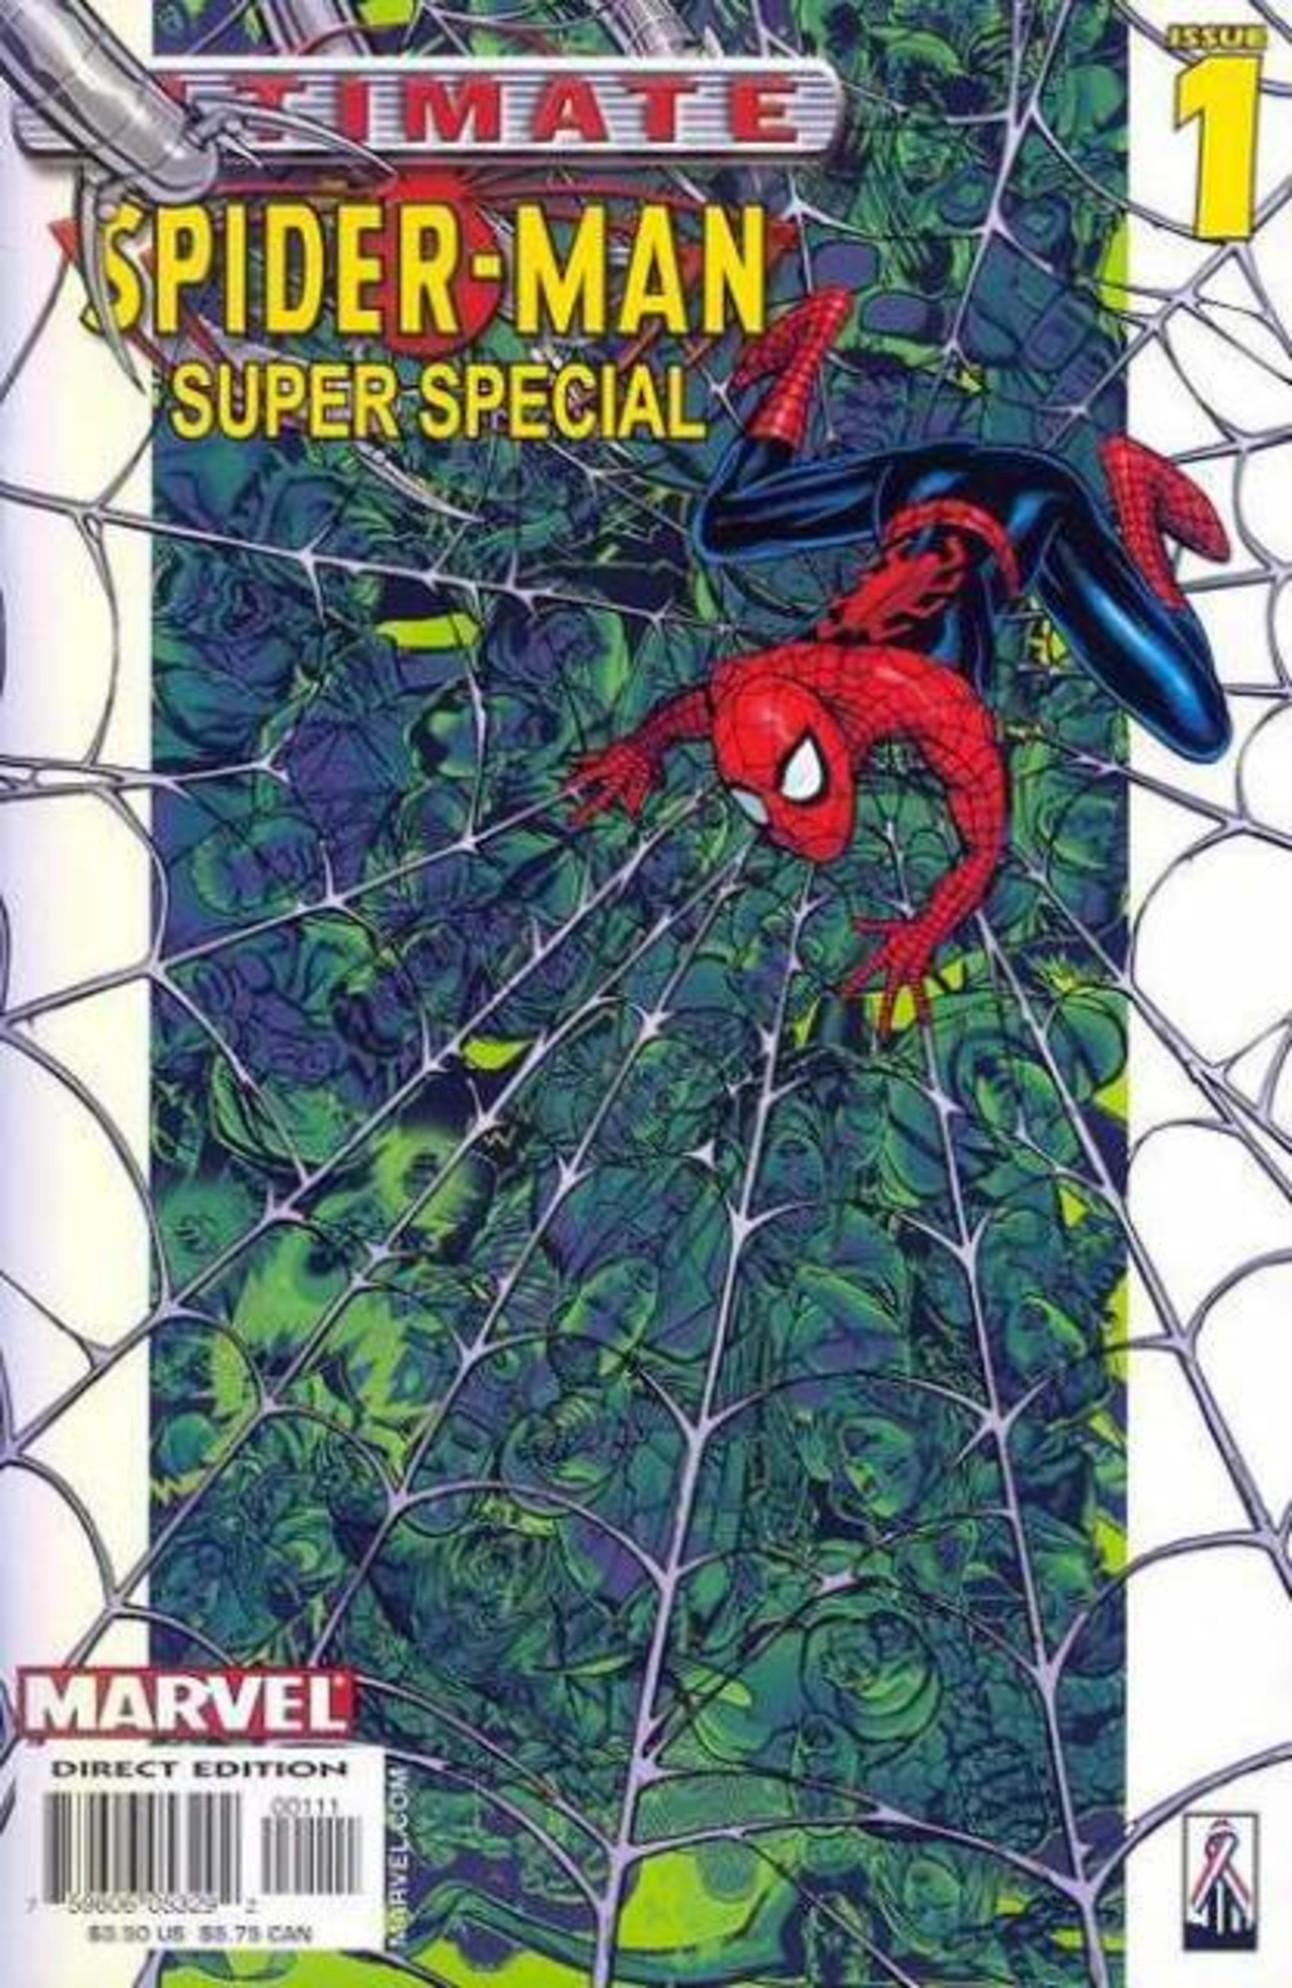 193047-19138-114448-1-ultimate-spider-man.jpg